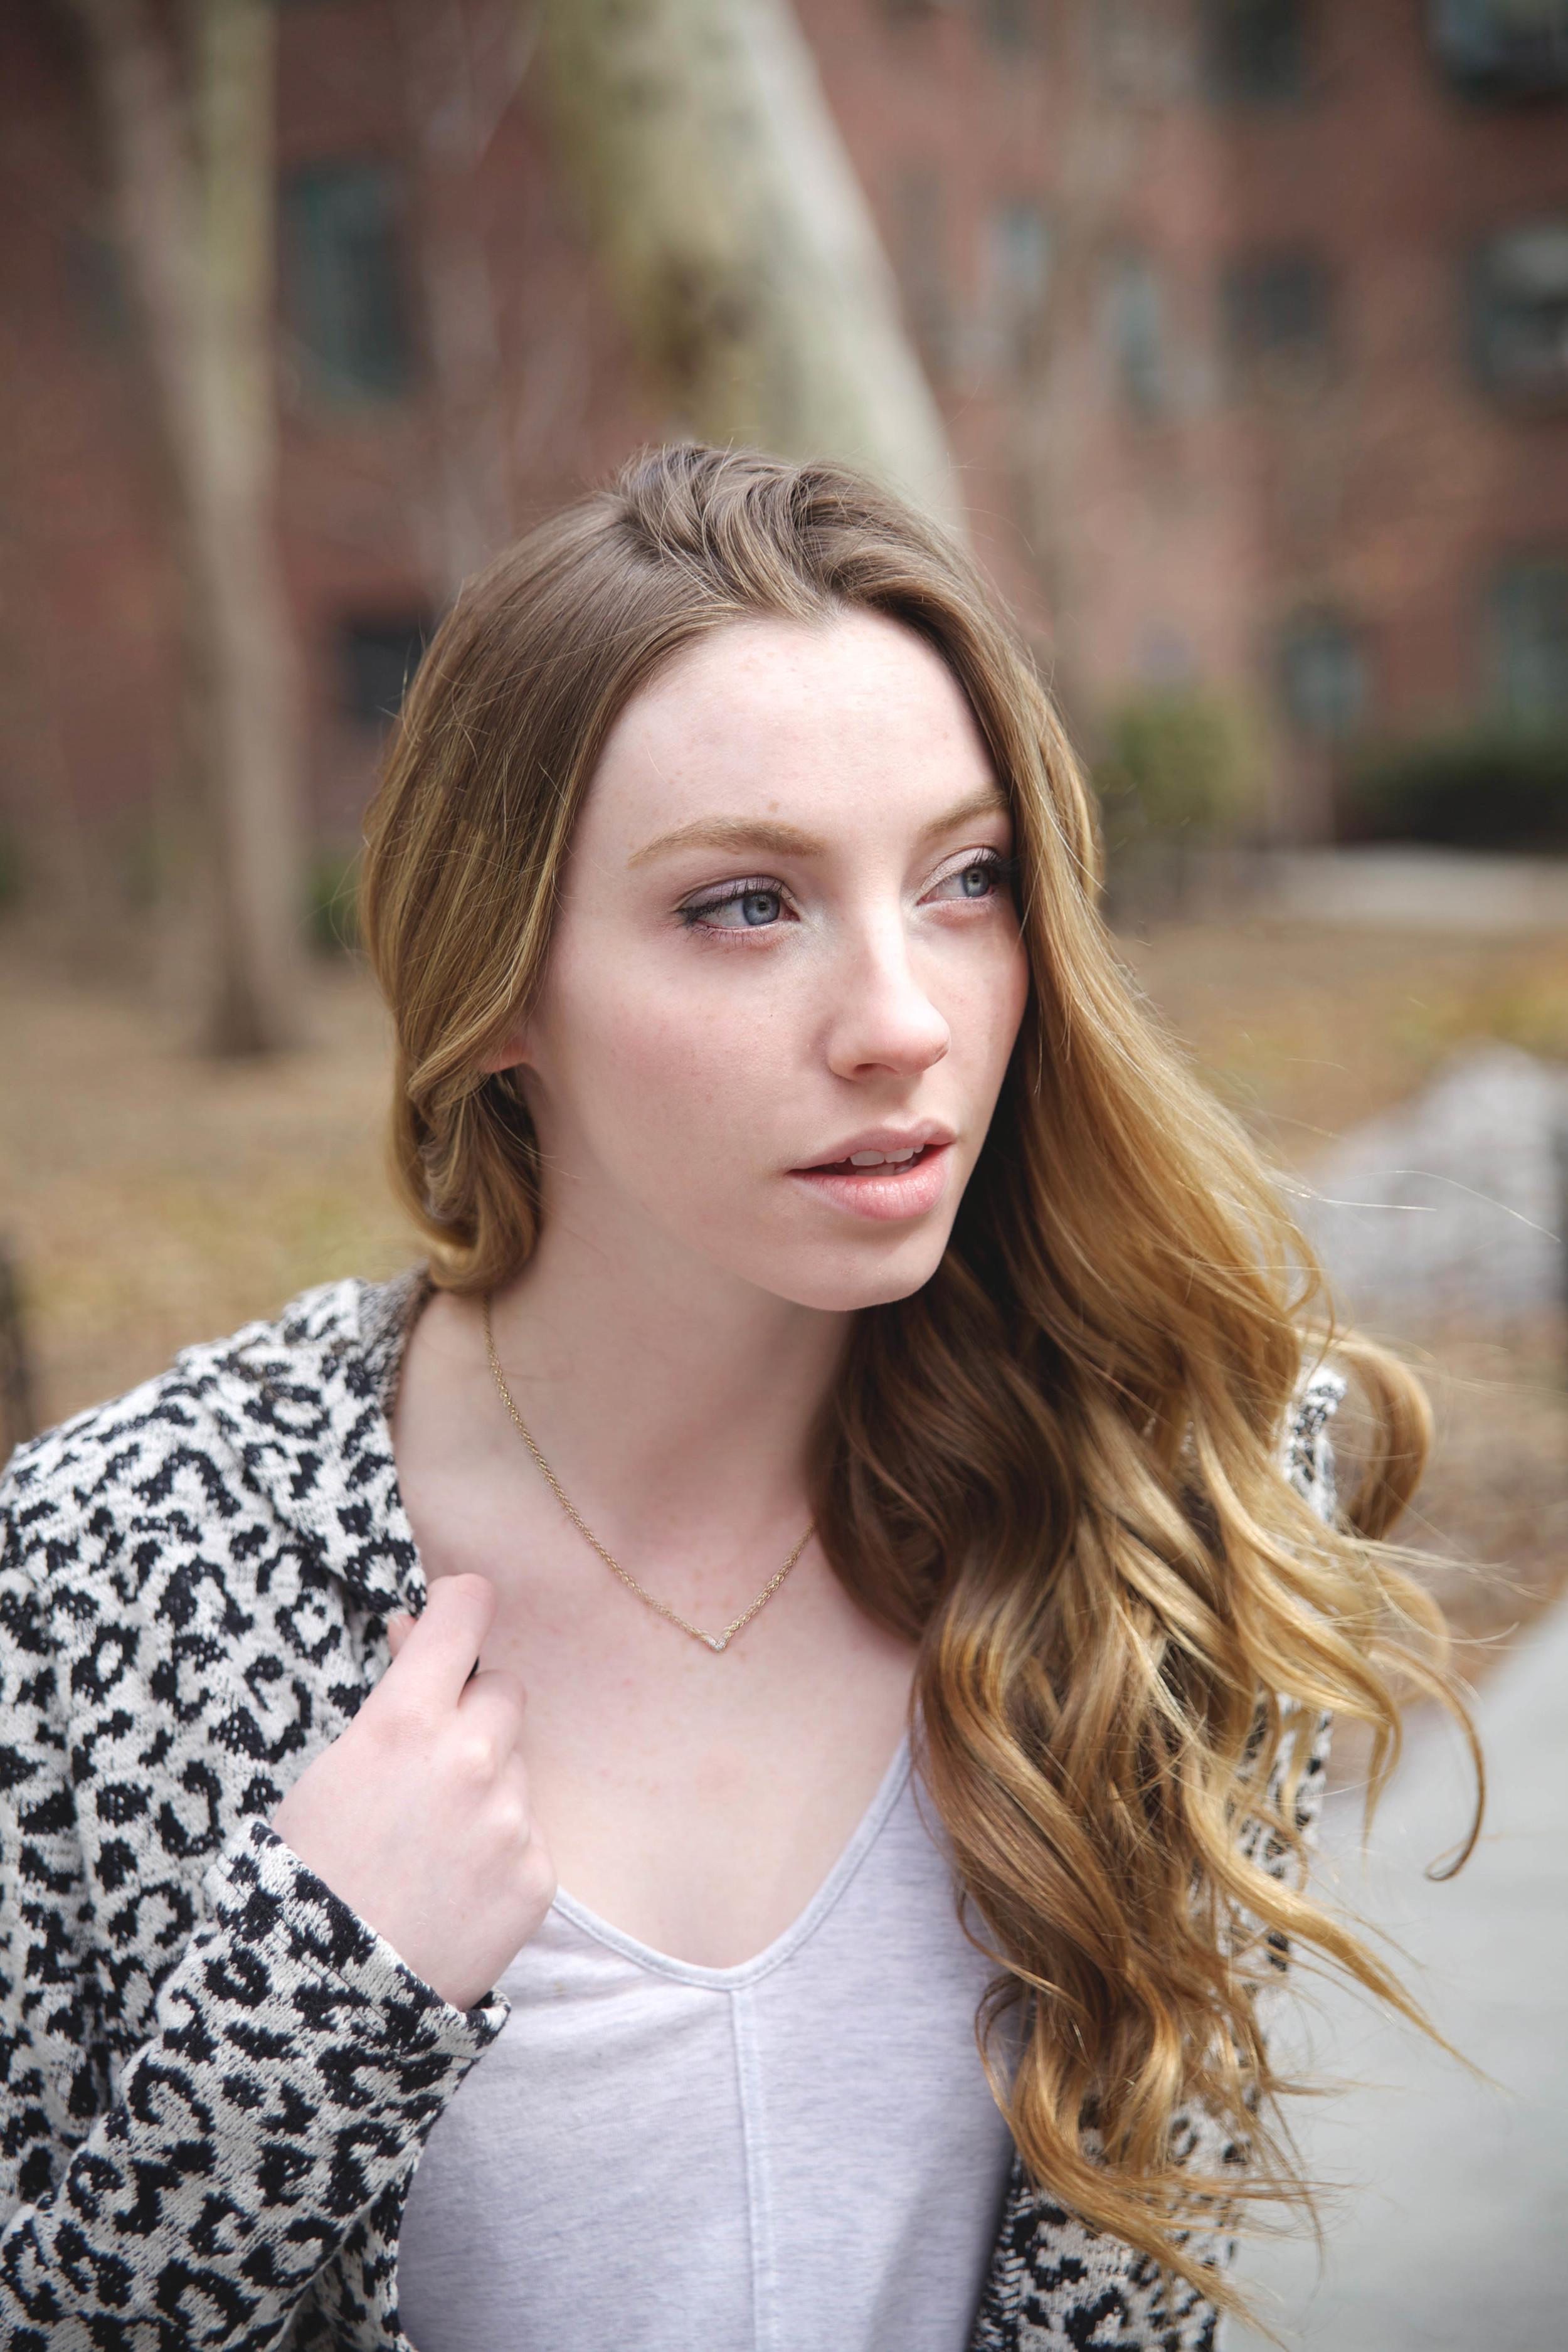 Delicate Pave Necklace via Rocksbox | Girl x Garment